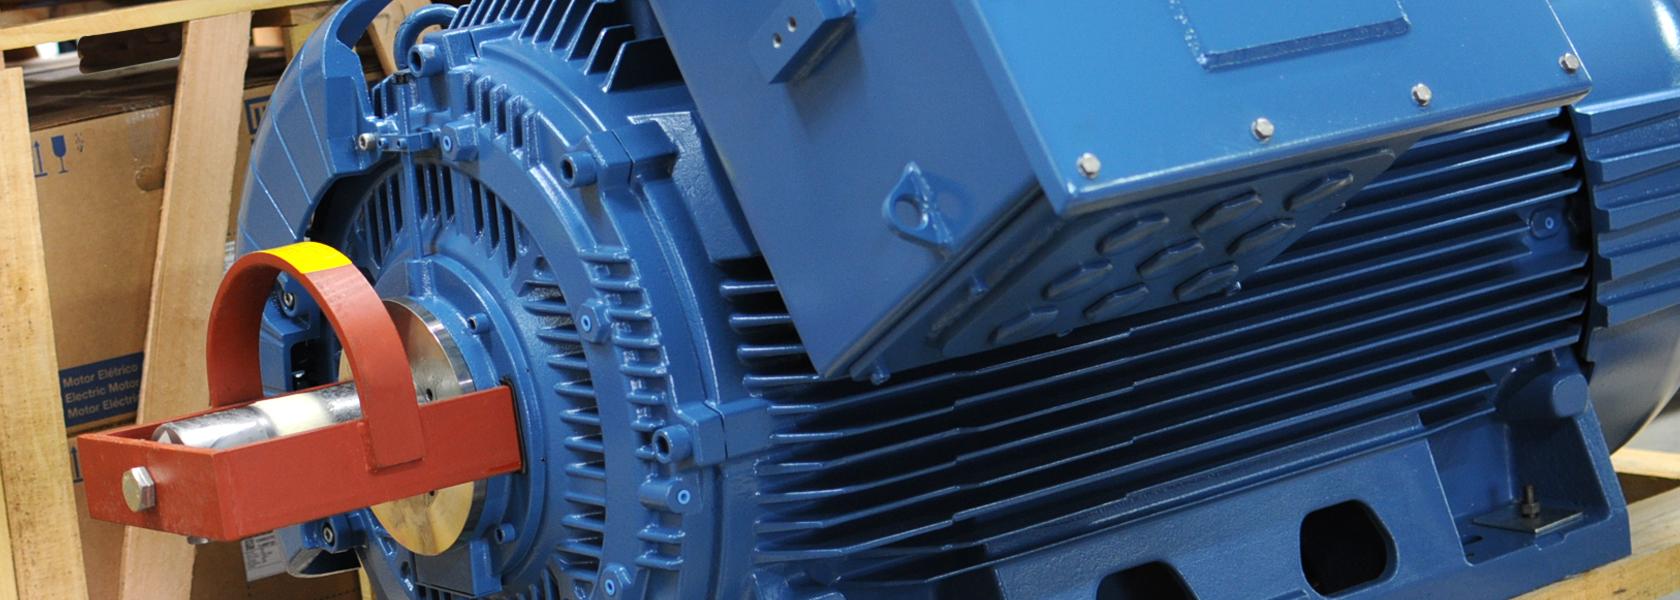 Stiavelli Irio Srl Weg Electric Motors Official Distributor